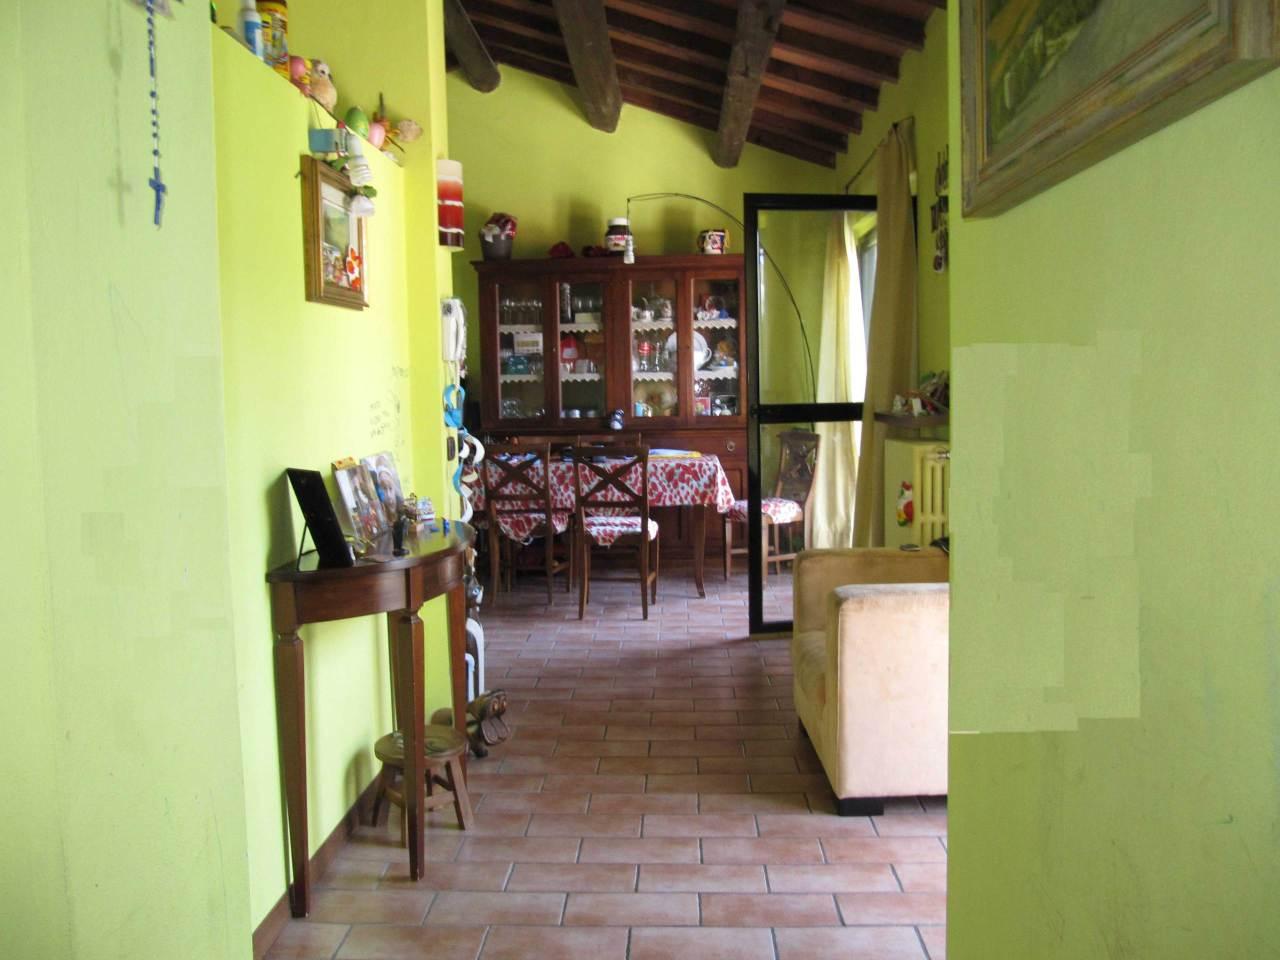 Bilocale Parma Via Case Vecchie 9